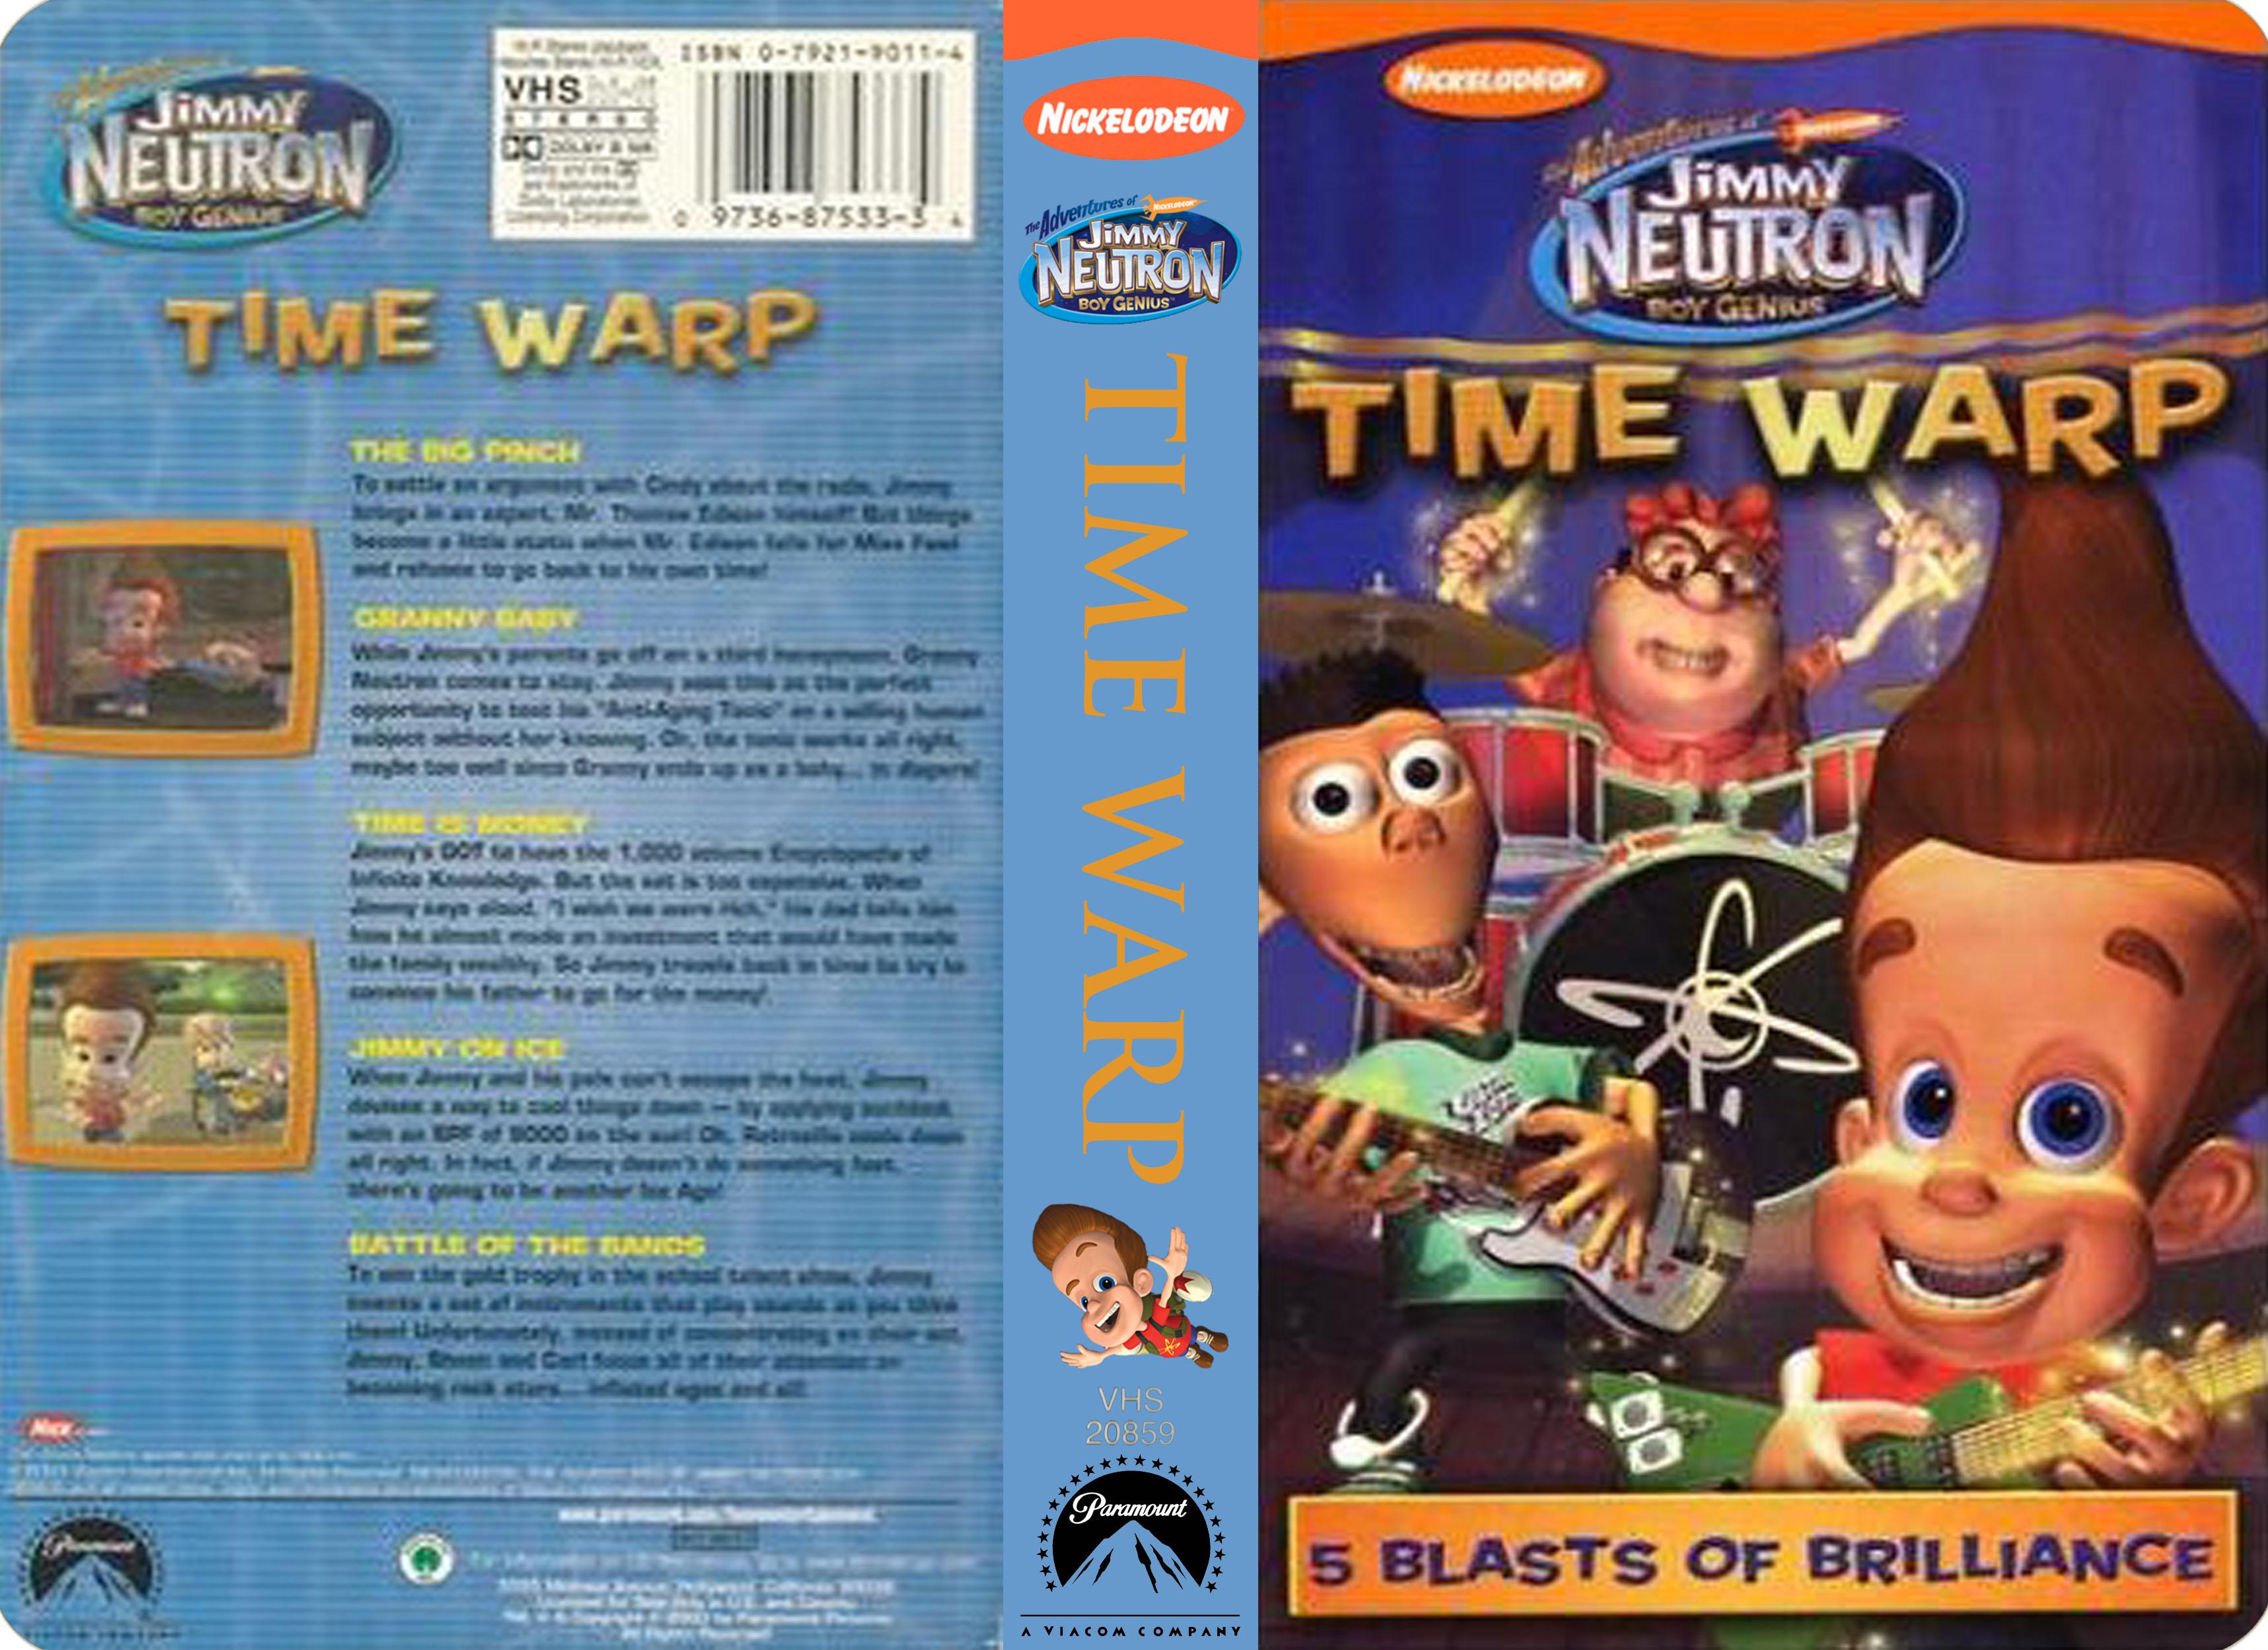 Jimmy Neutron images Nickelodeons Jimmy Neutron Time Warp VHS HD 3434x2499